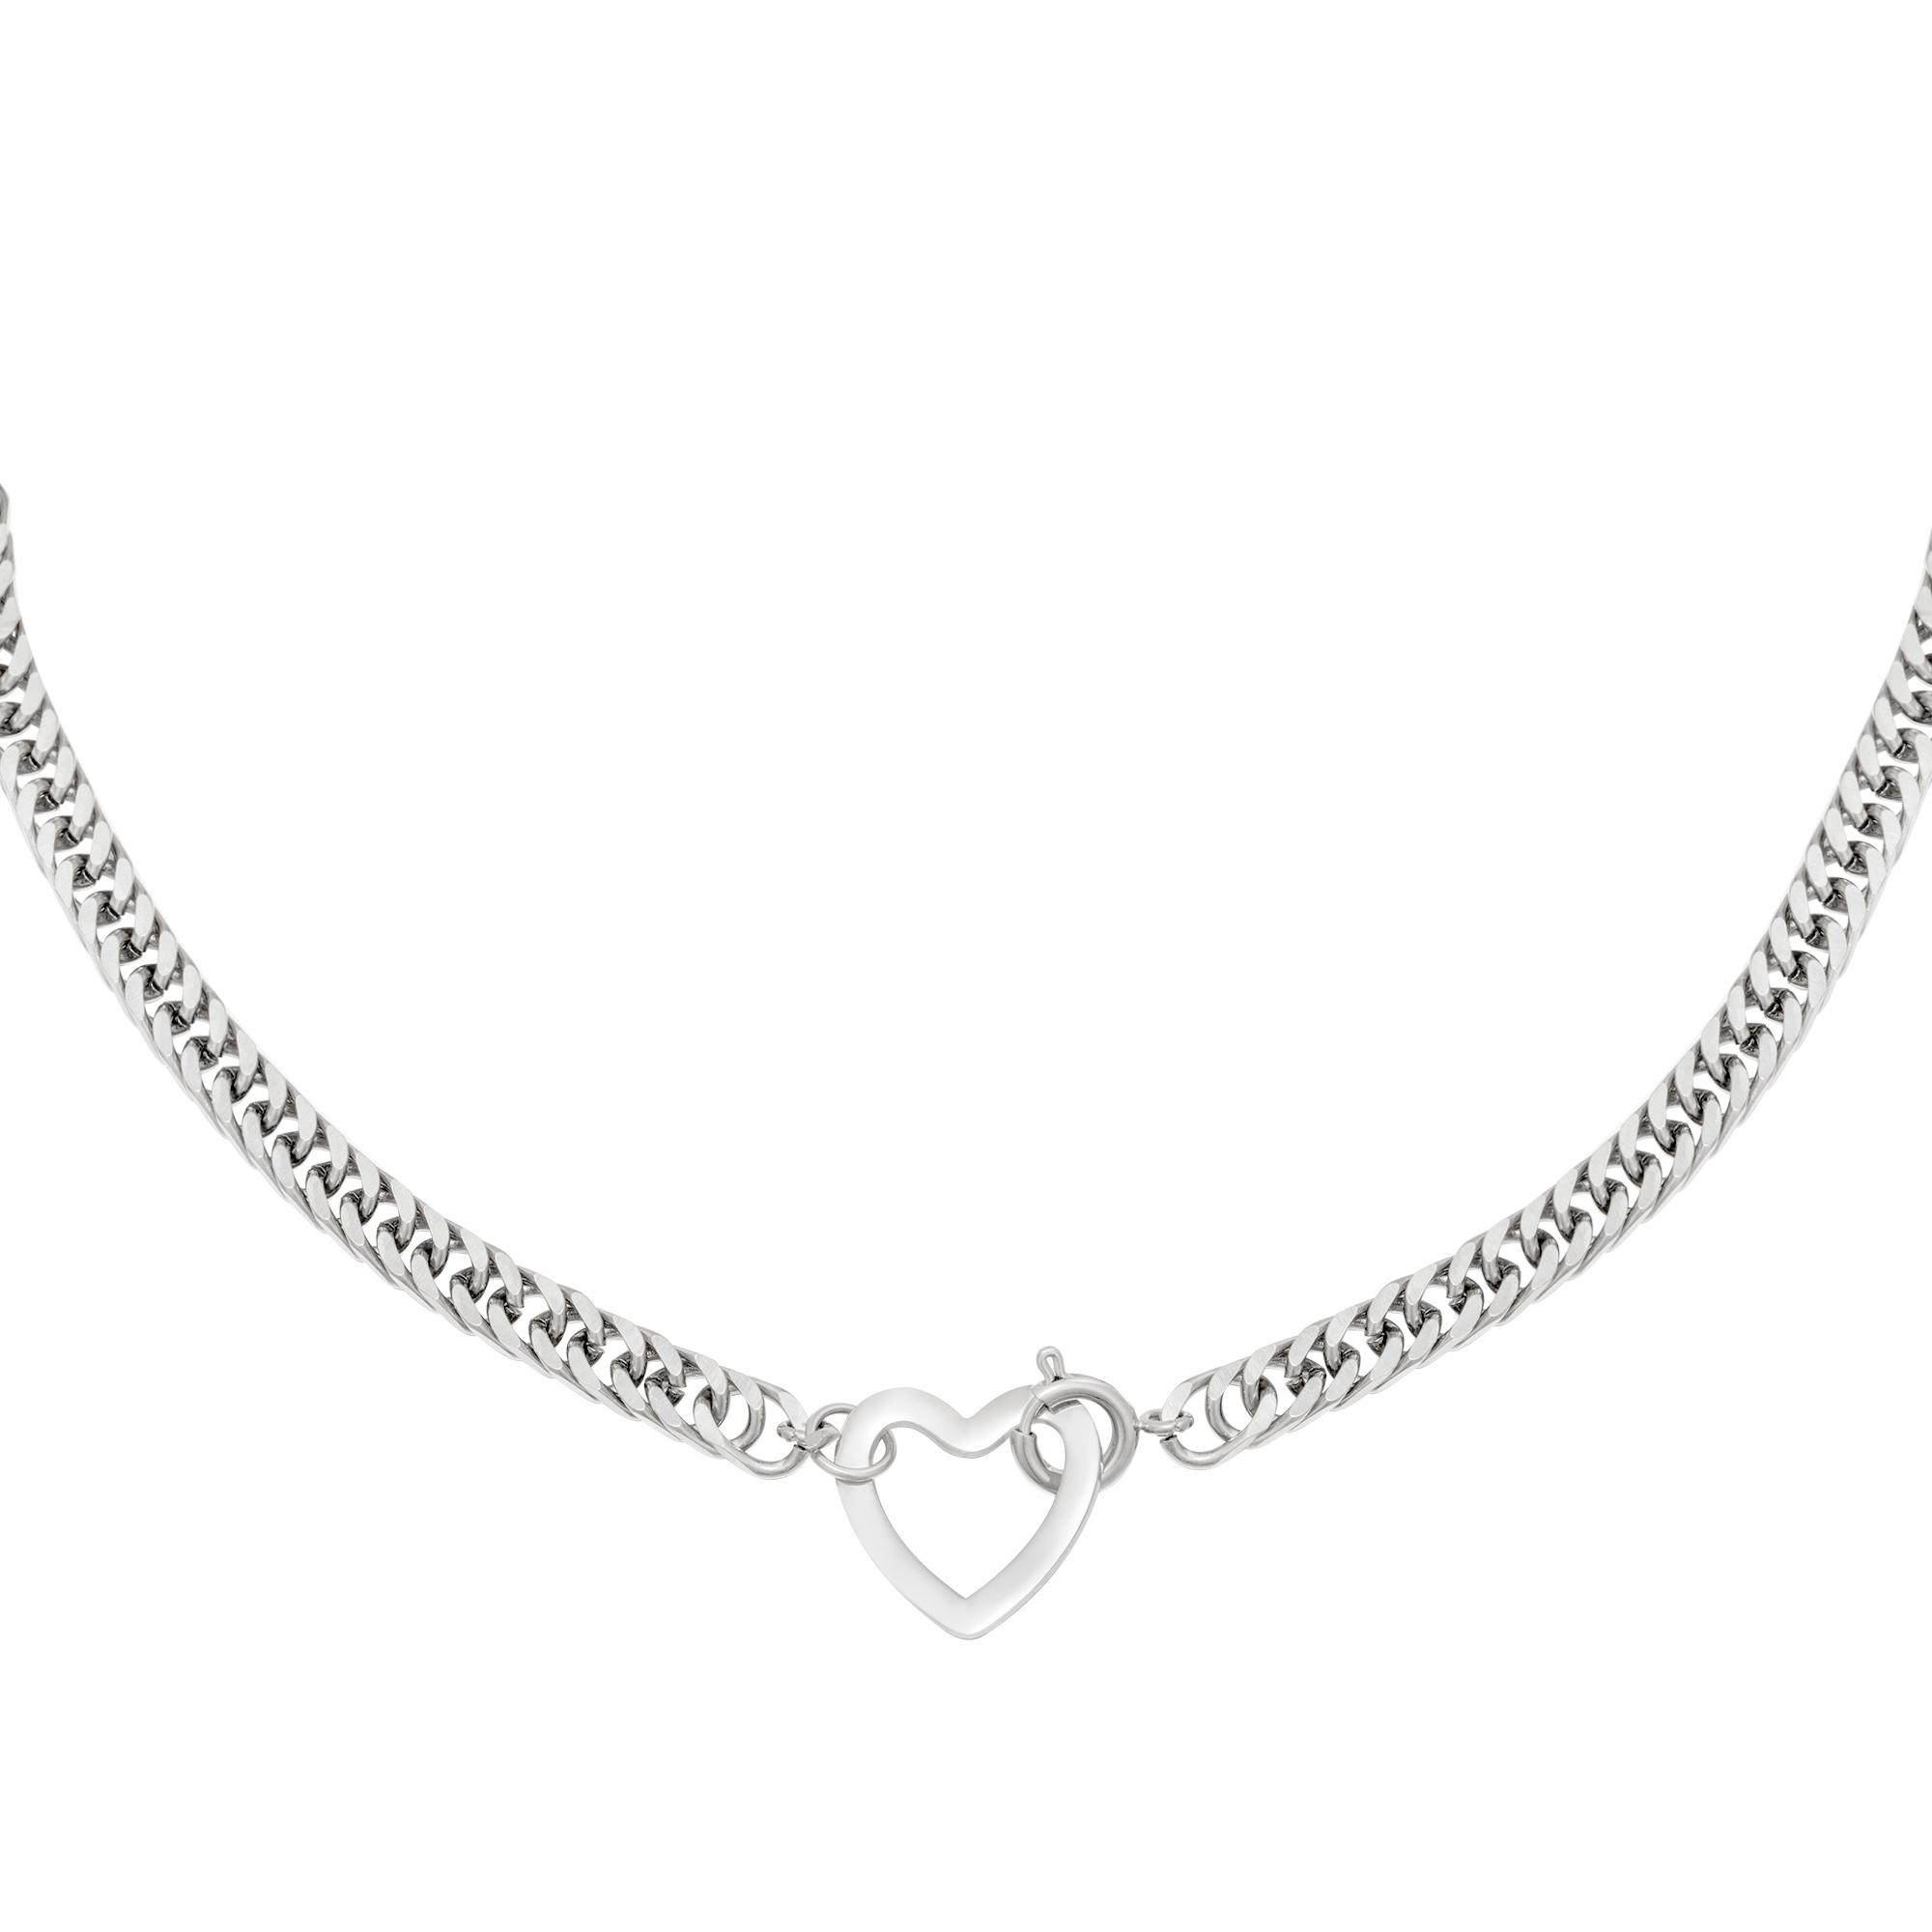 Halskette lovely